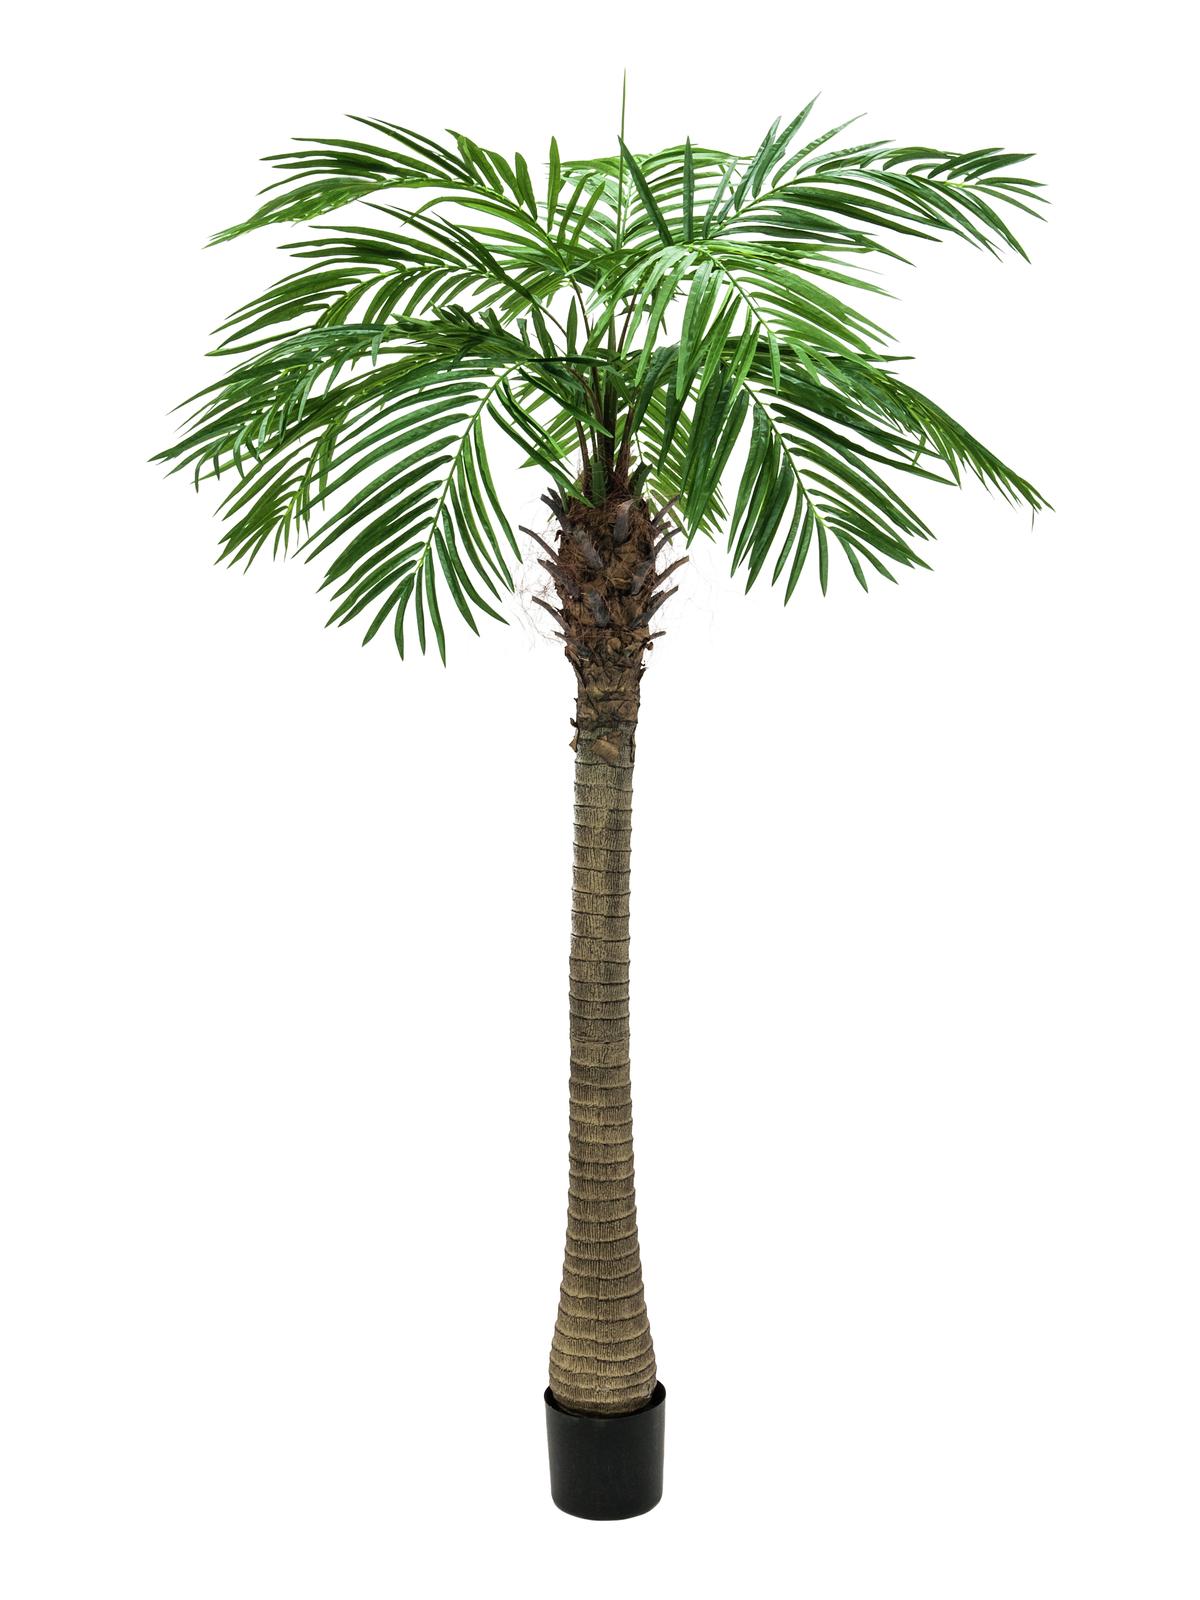 EUROPALMS pianta artificiale Phoenix palma di lusso, 210cm